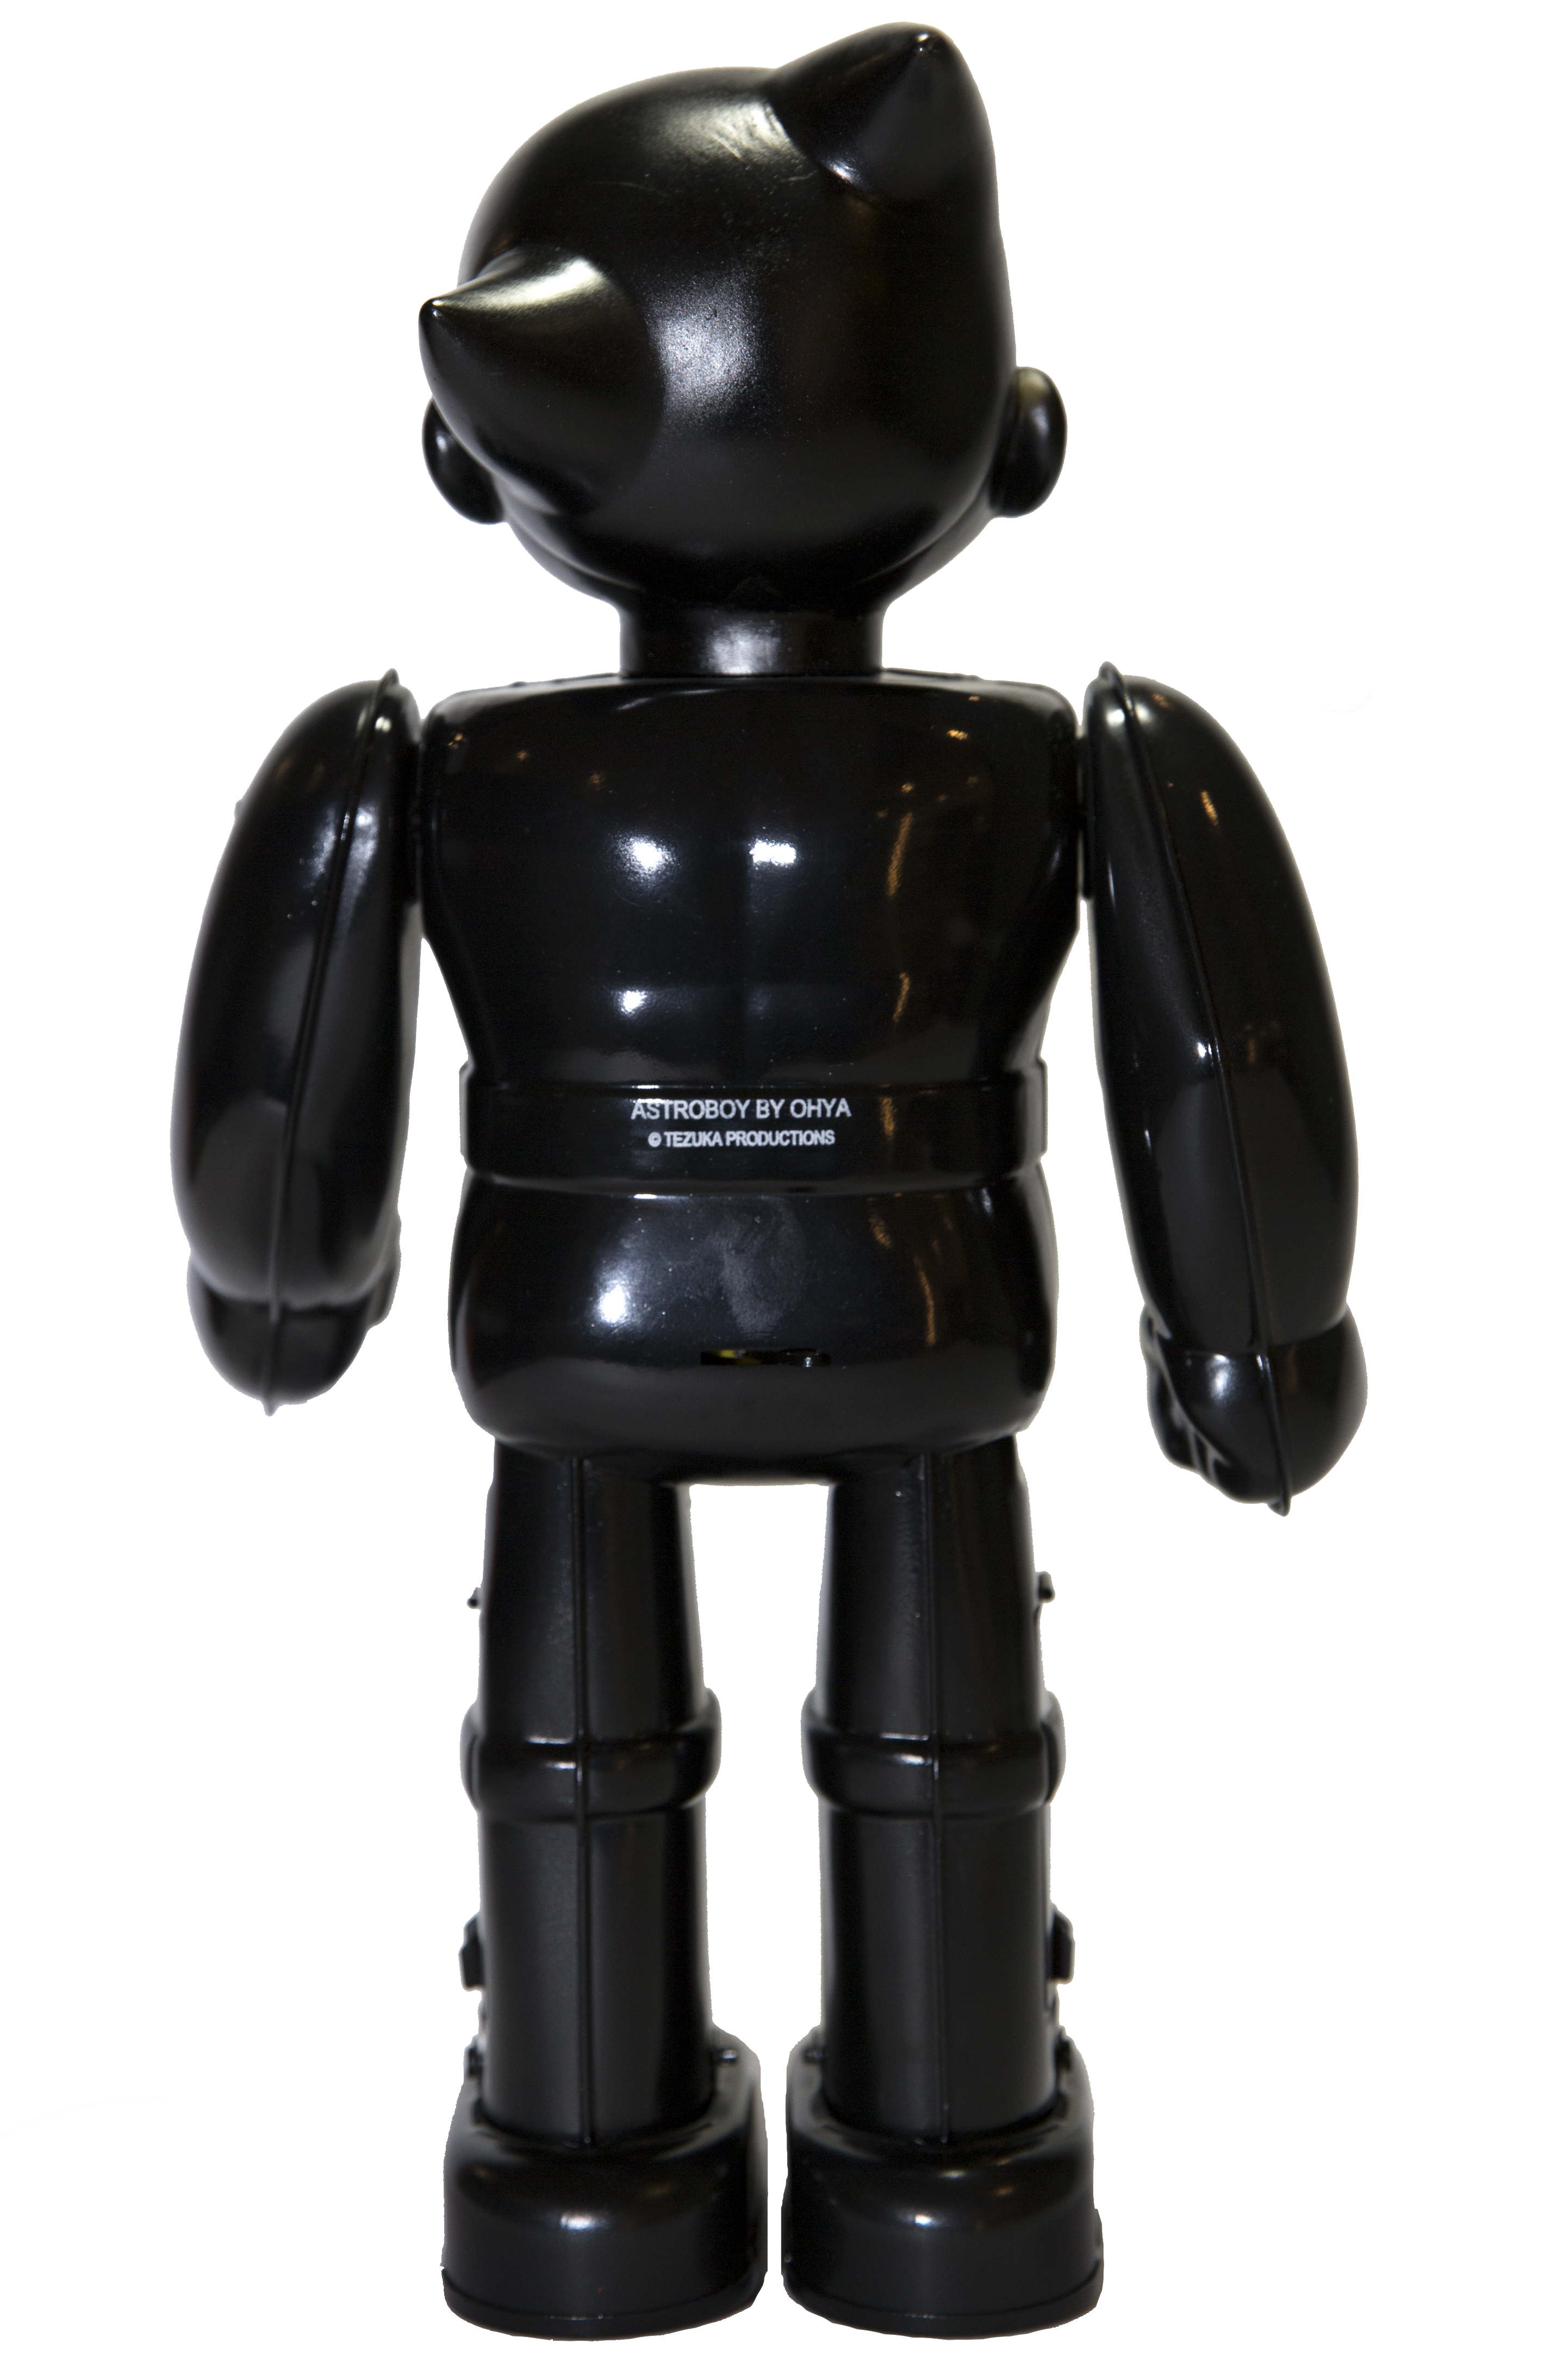 ASTROBOY 50TH BLACK ELECTRONIC